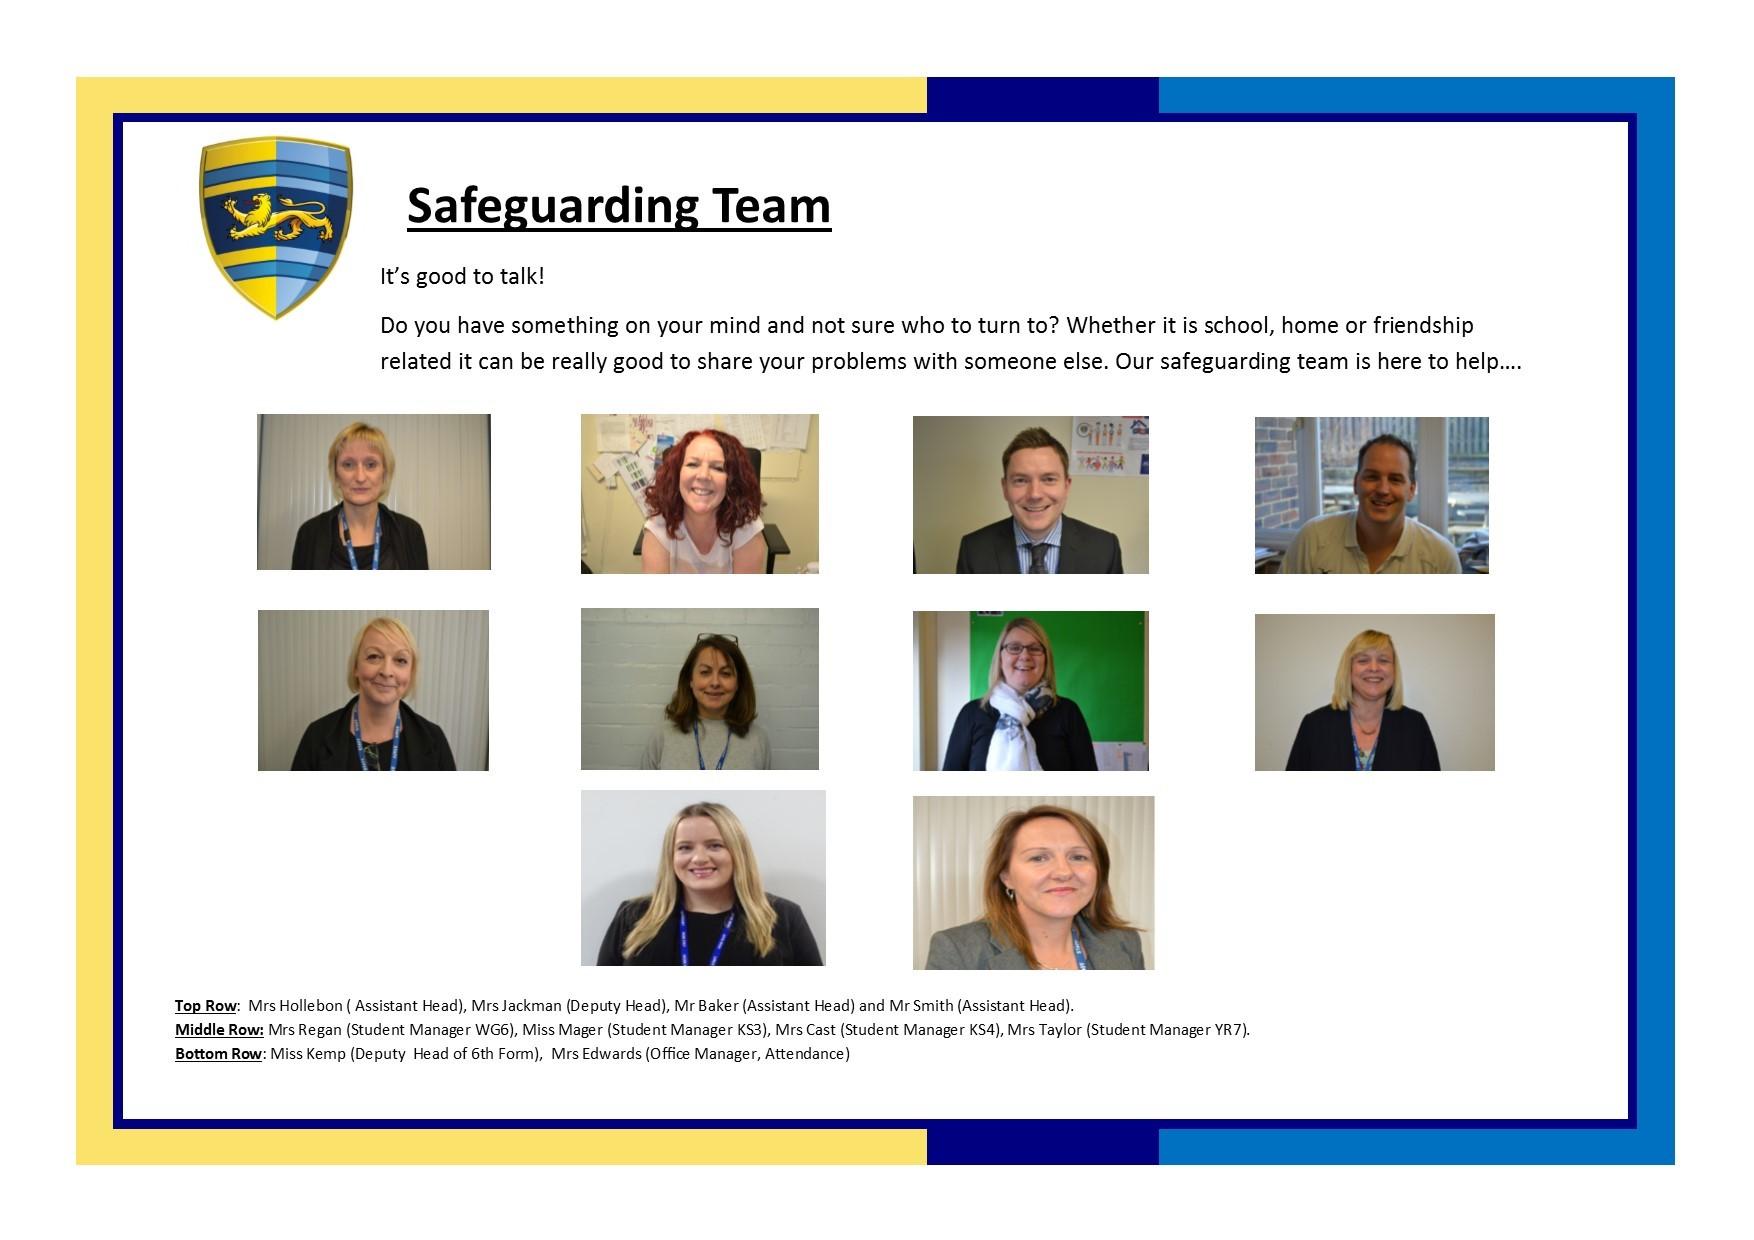 Safeguarding team